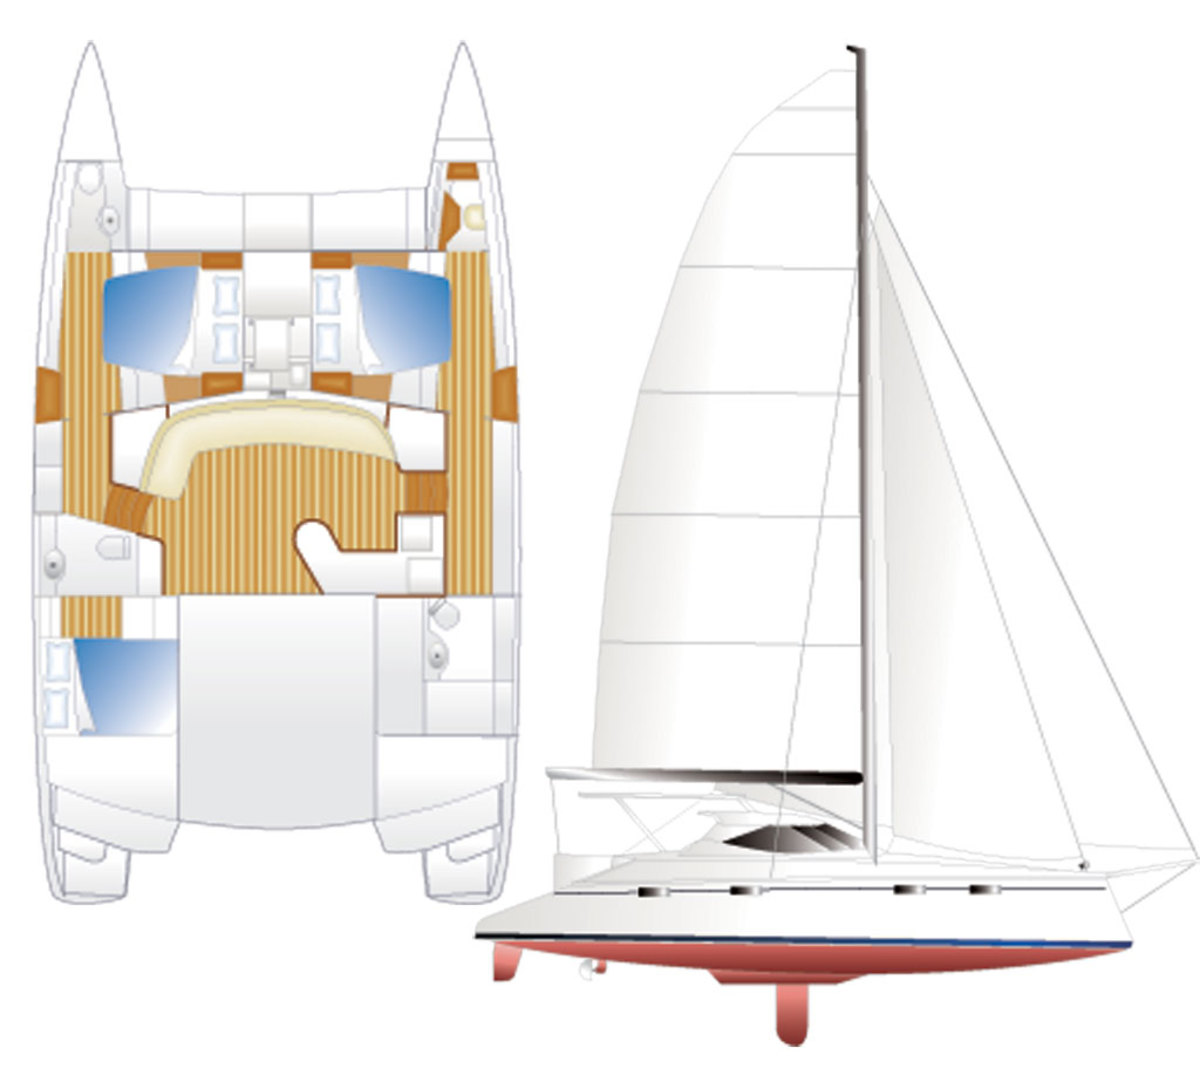 Balanc-451-sail-plan